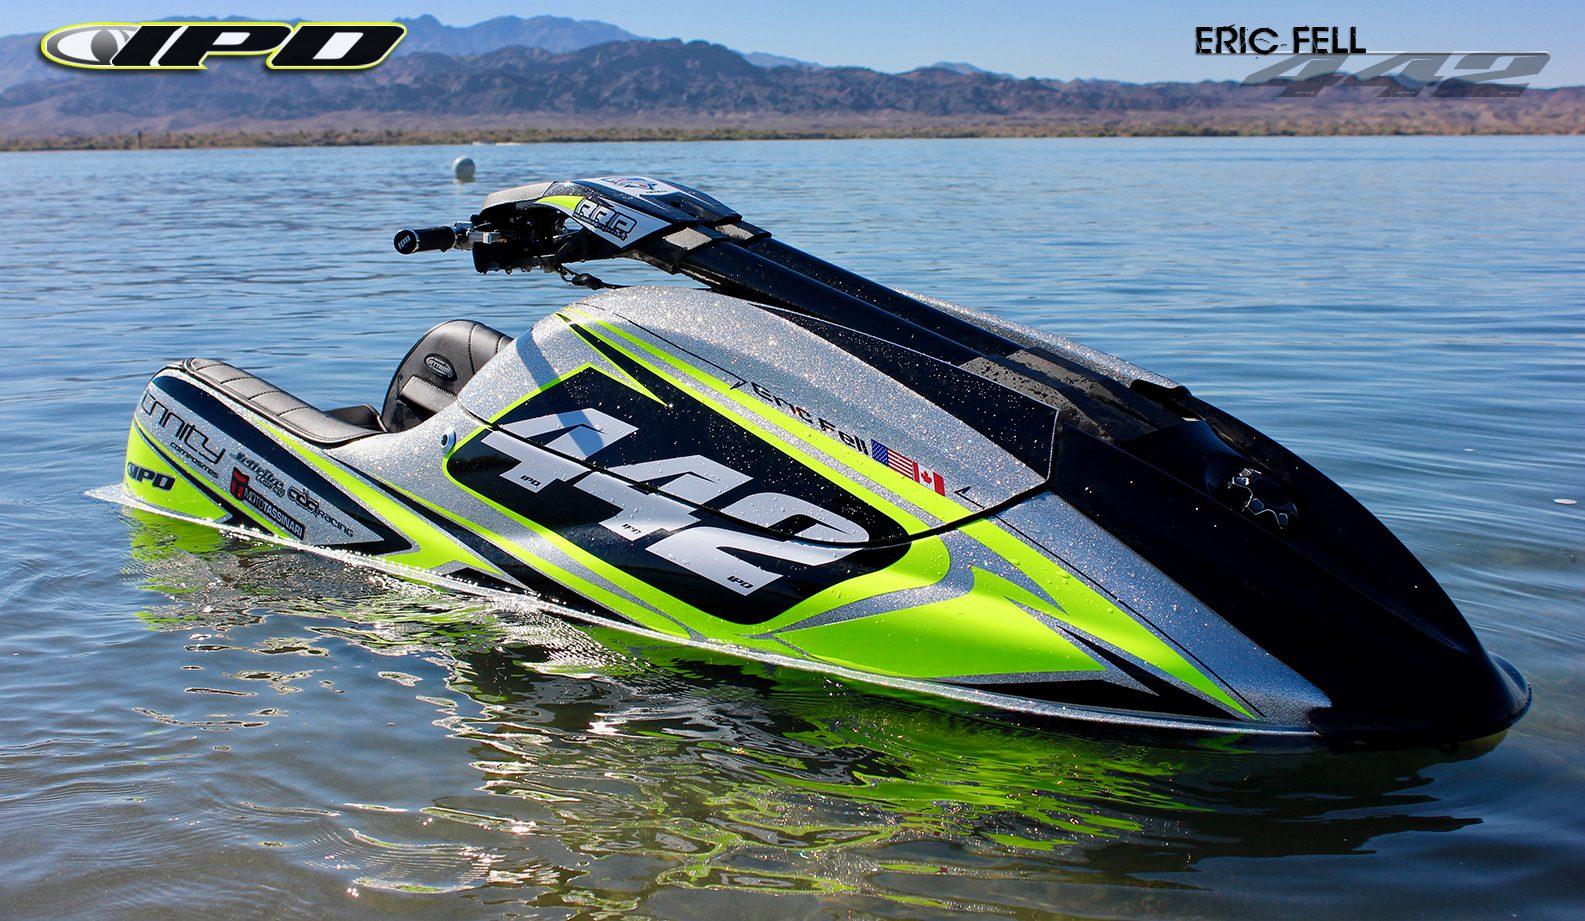 GK-EF-SXR installed on Eric Fell's Kawasaki SXR